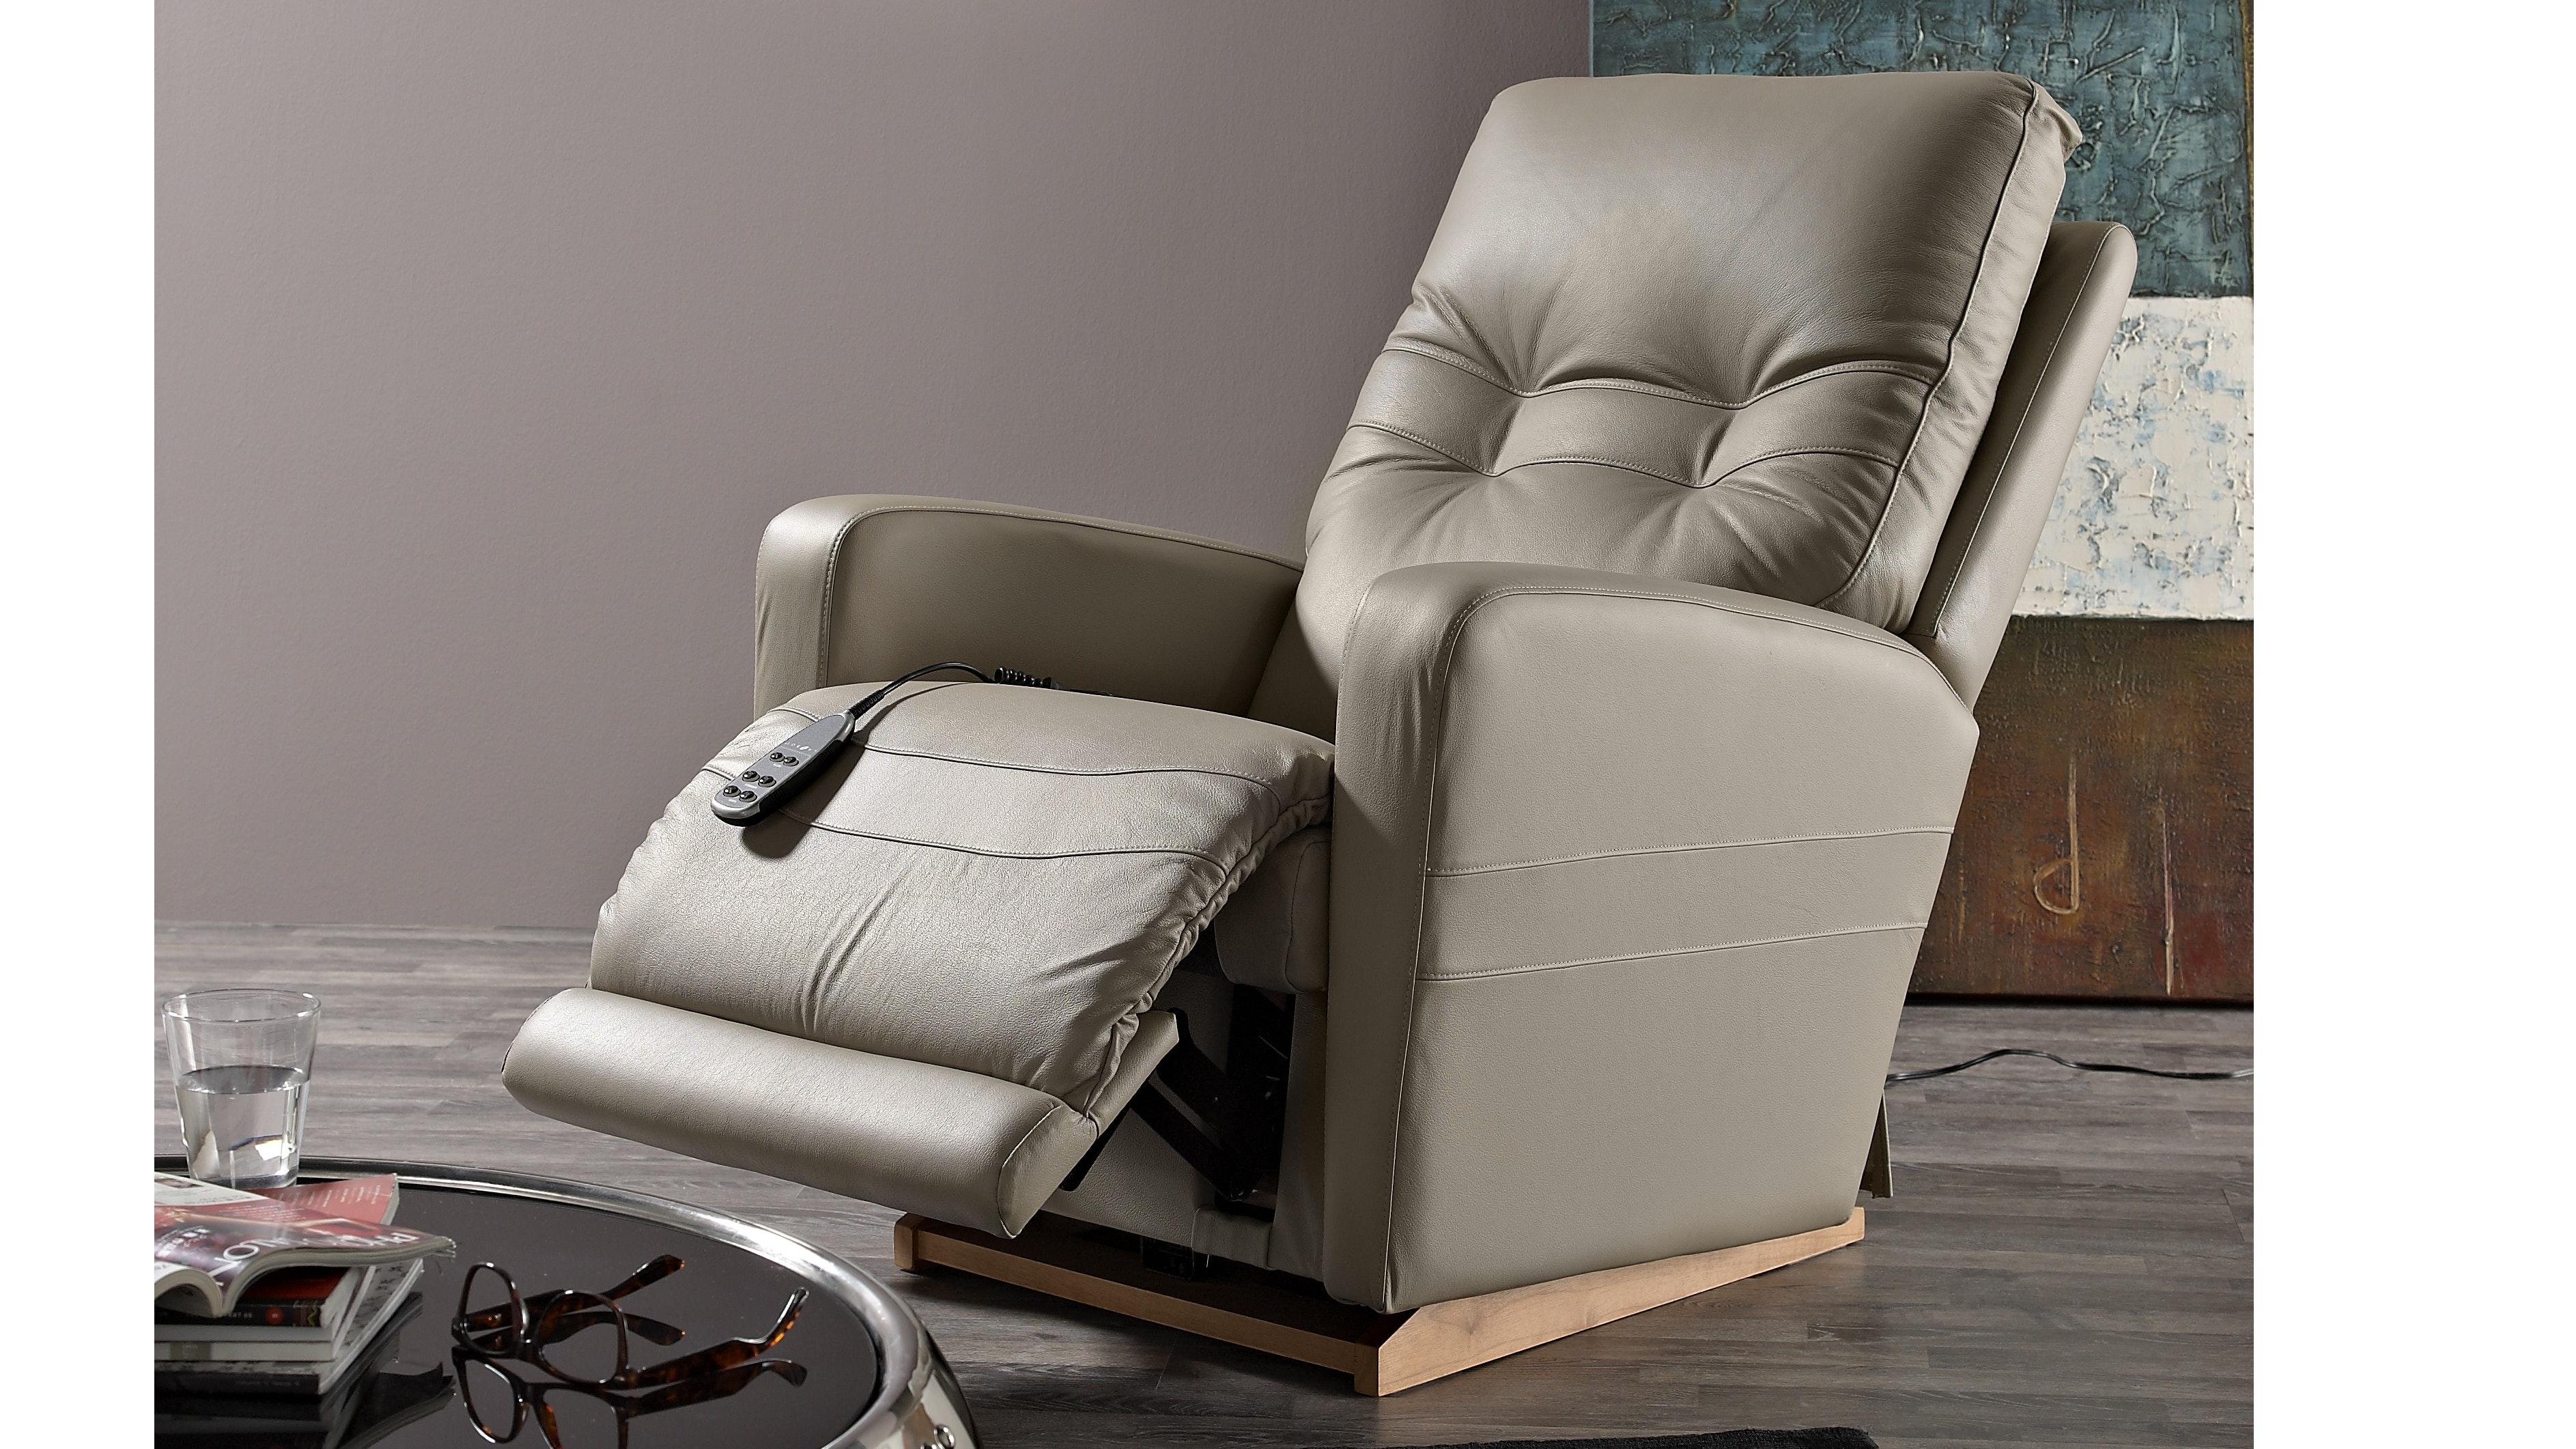 La-Z-Boy Power XR Genoa Recliner  sc 1 st  Harvey Norman & Furniture Furniture Singapore u2013 Armchair Recliner Chair | Harvey ... islam-shia.org